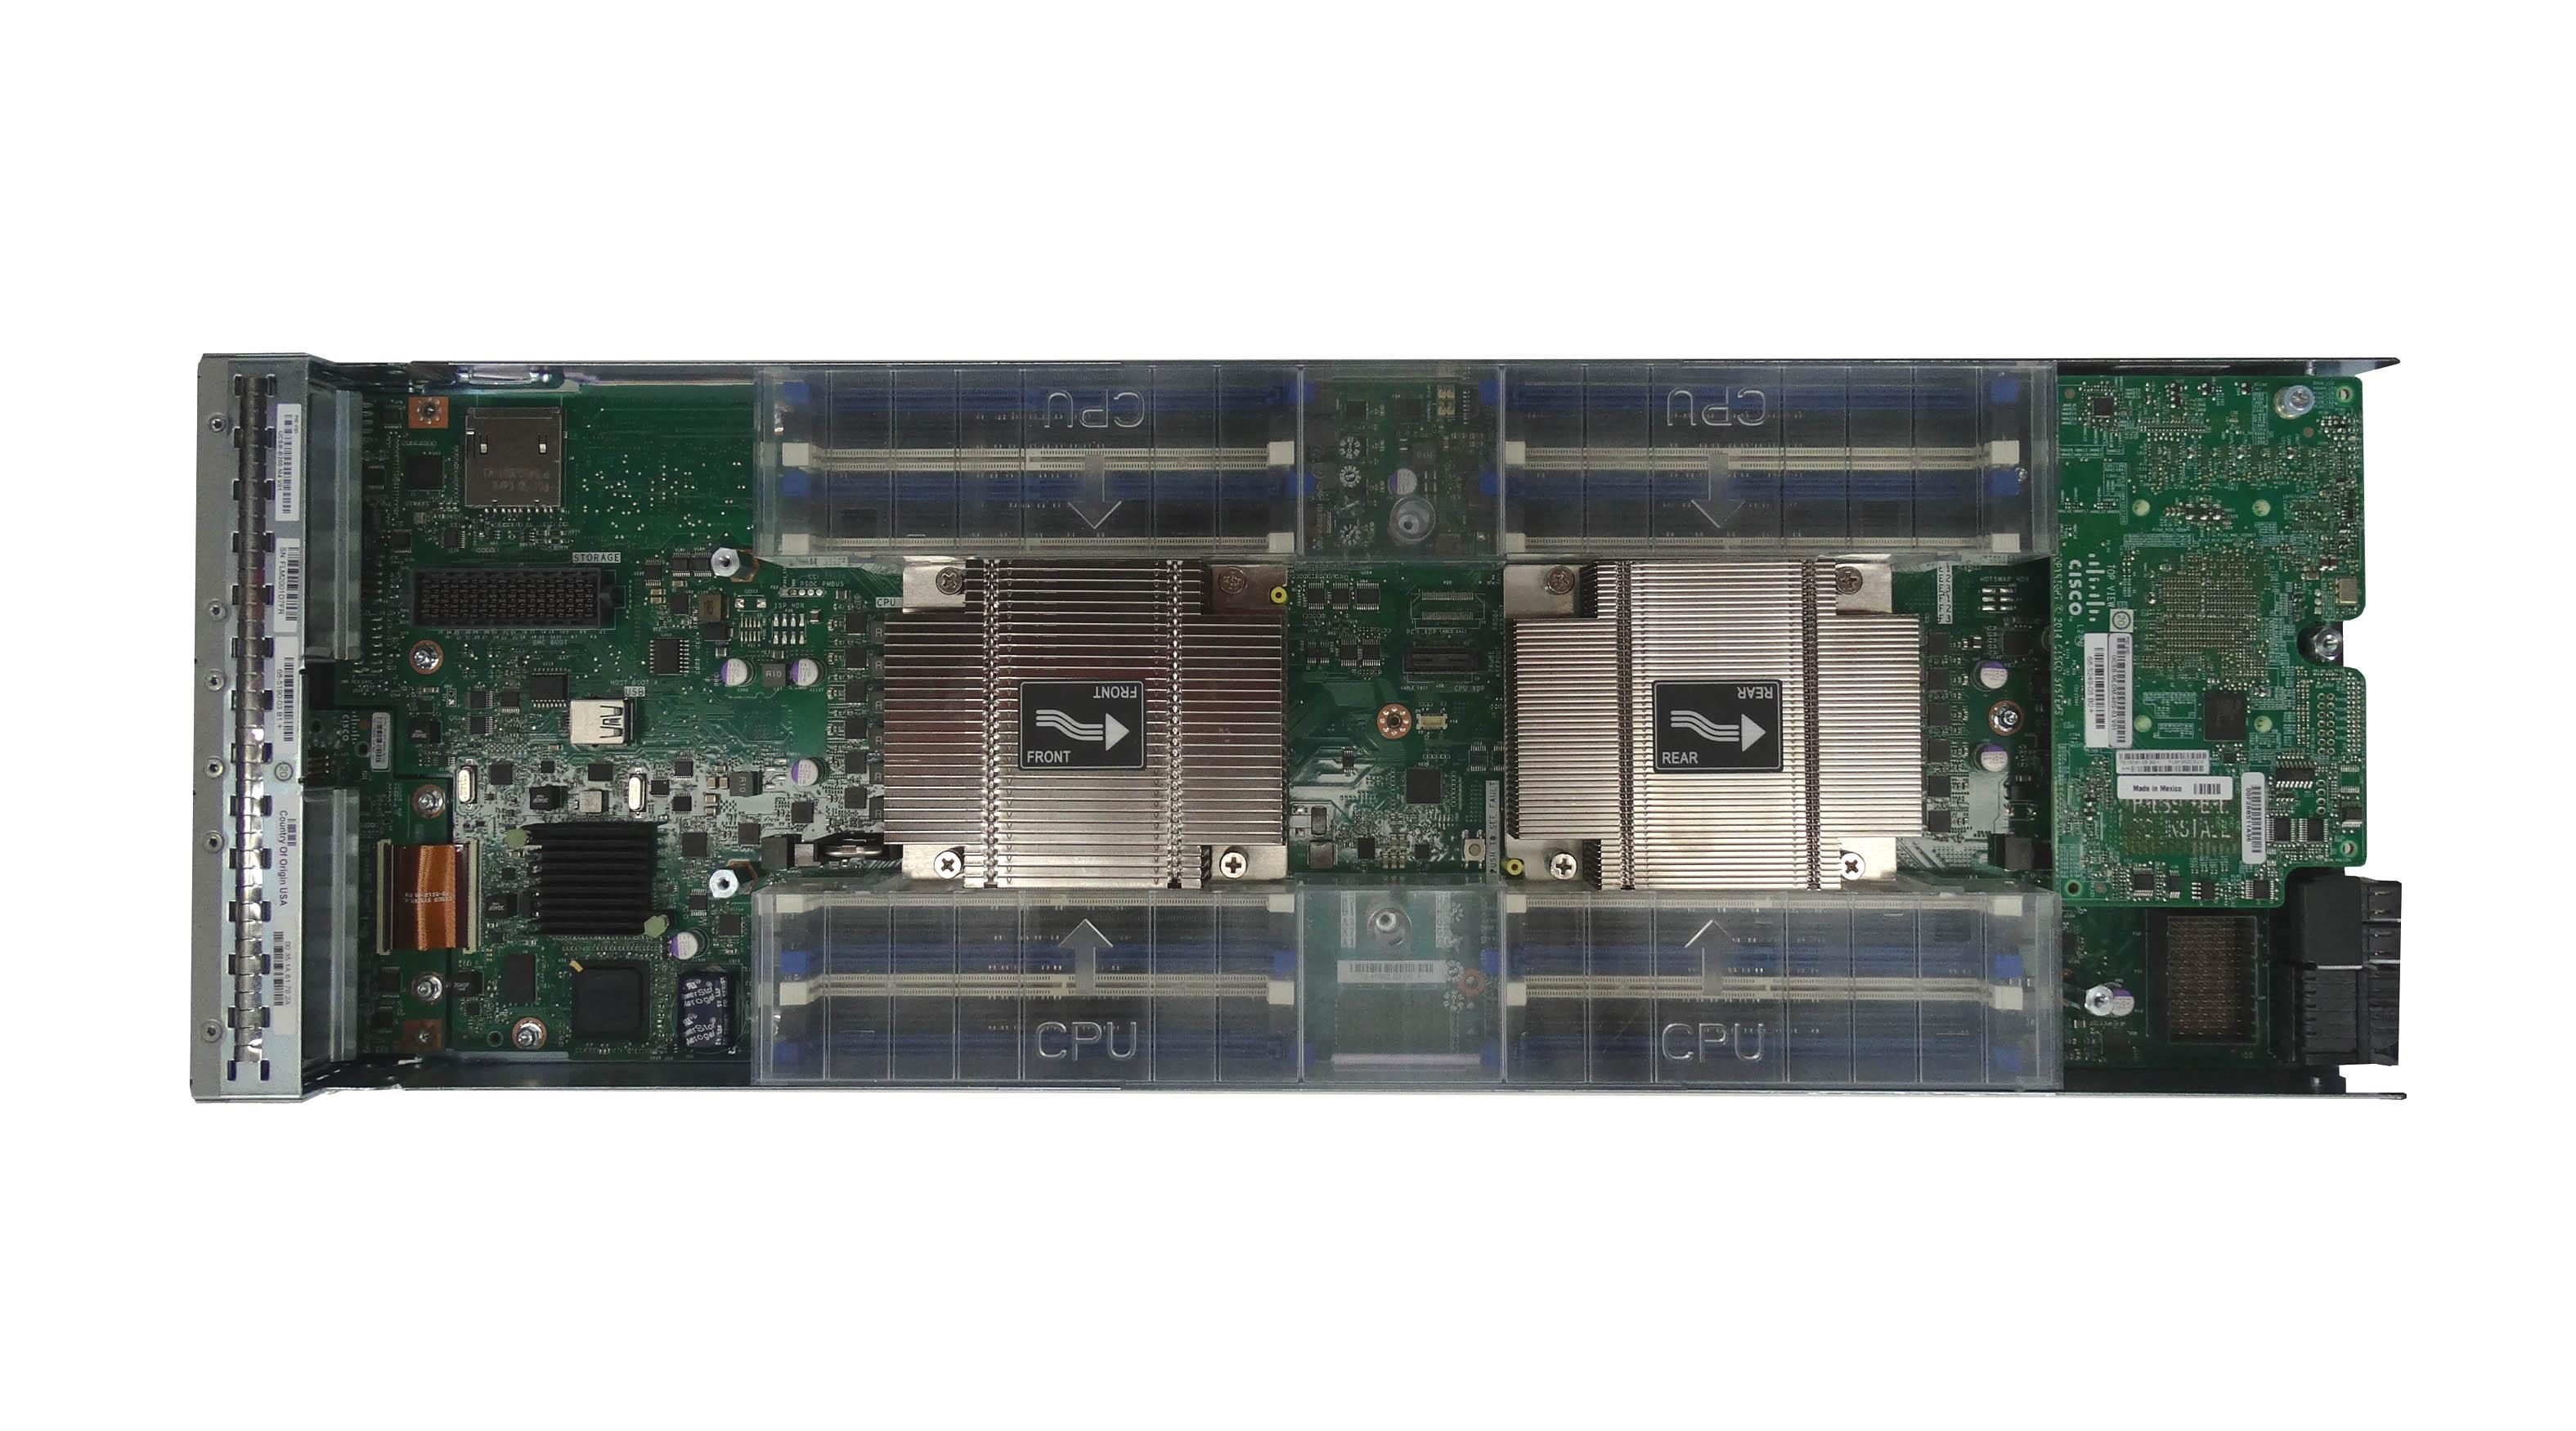 Cisco UCS B200 M4 2-Bay Blade Server (UCSB-B200-M4)